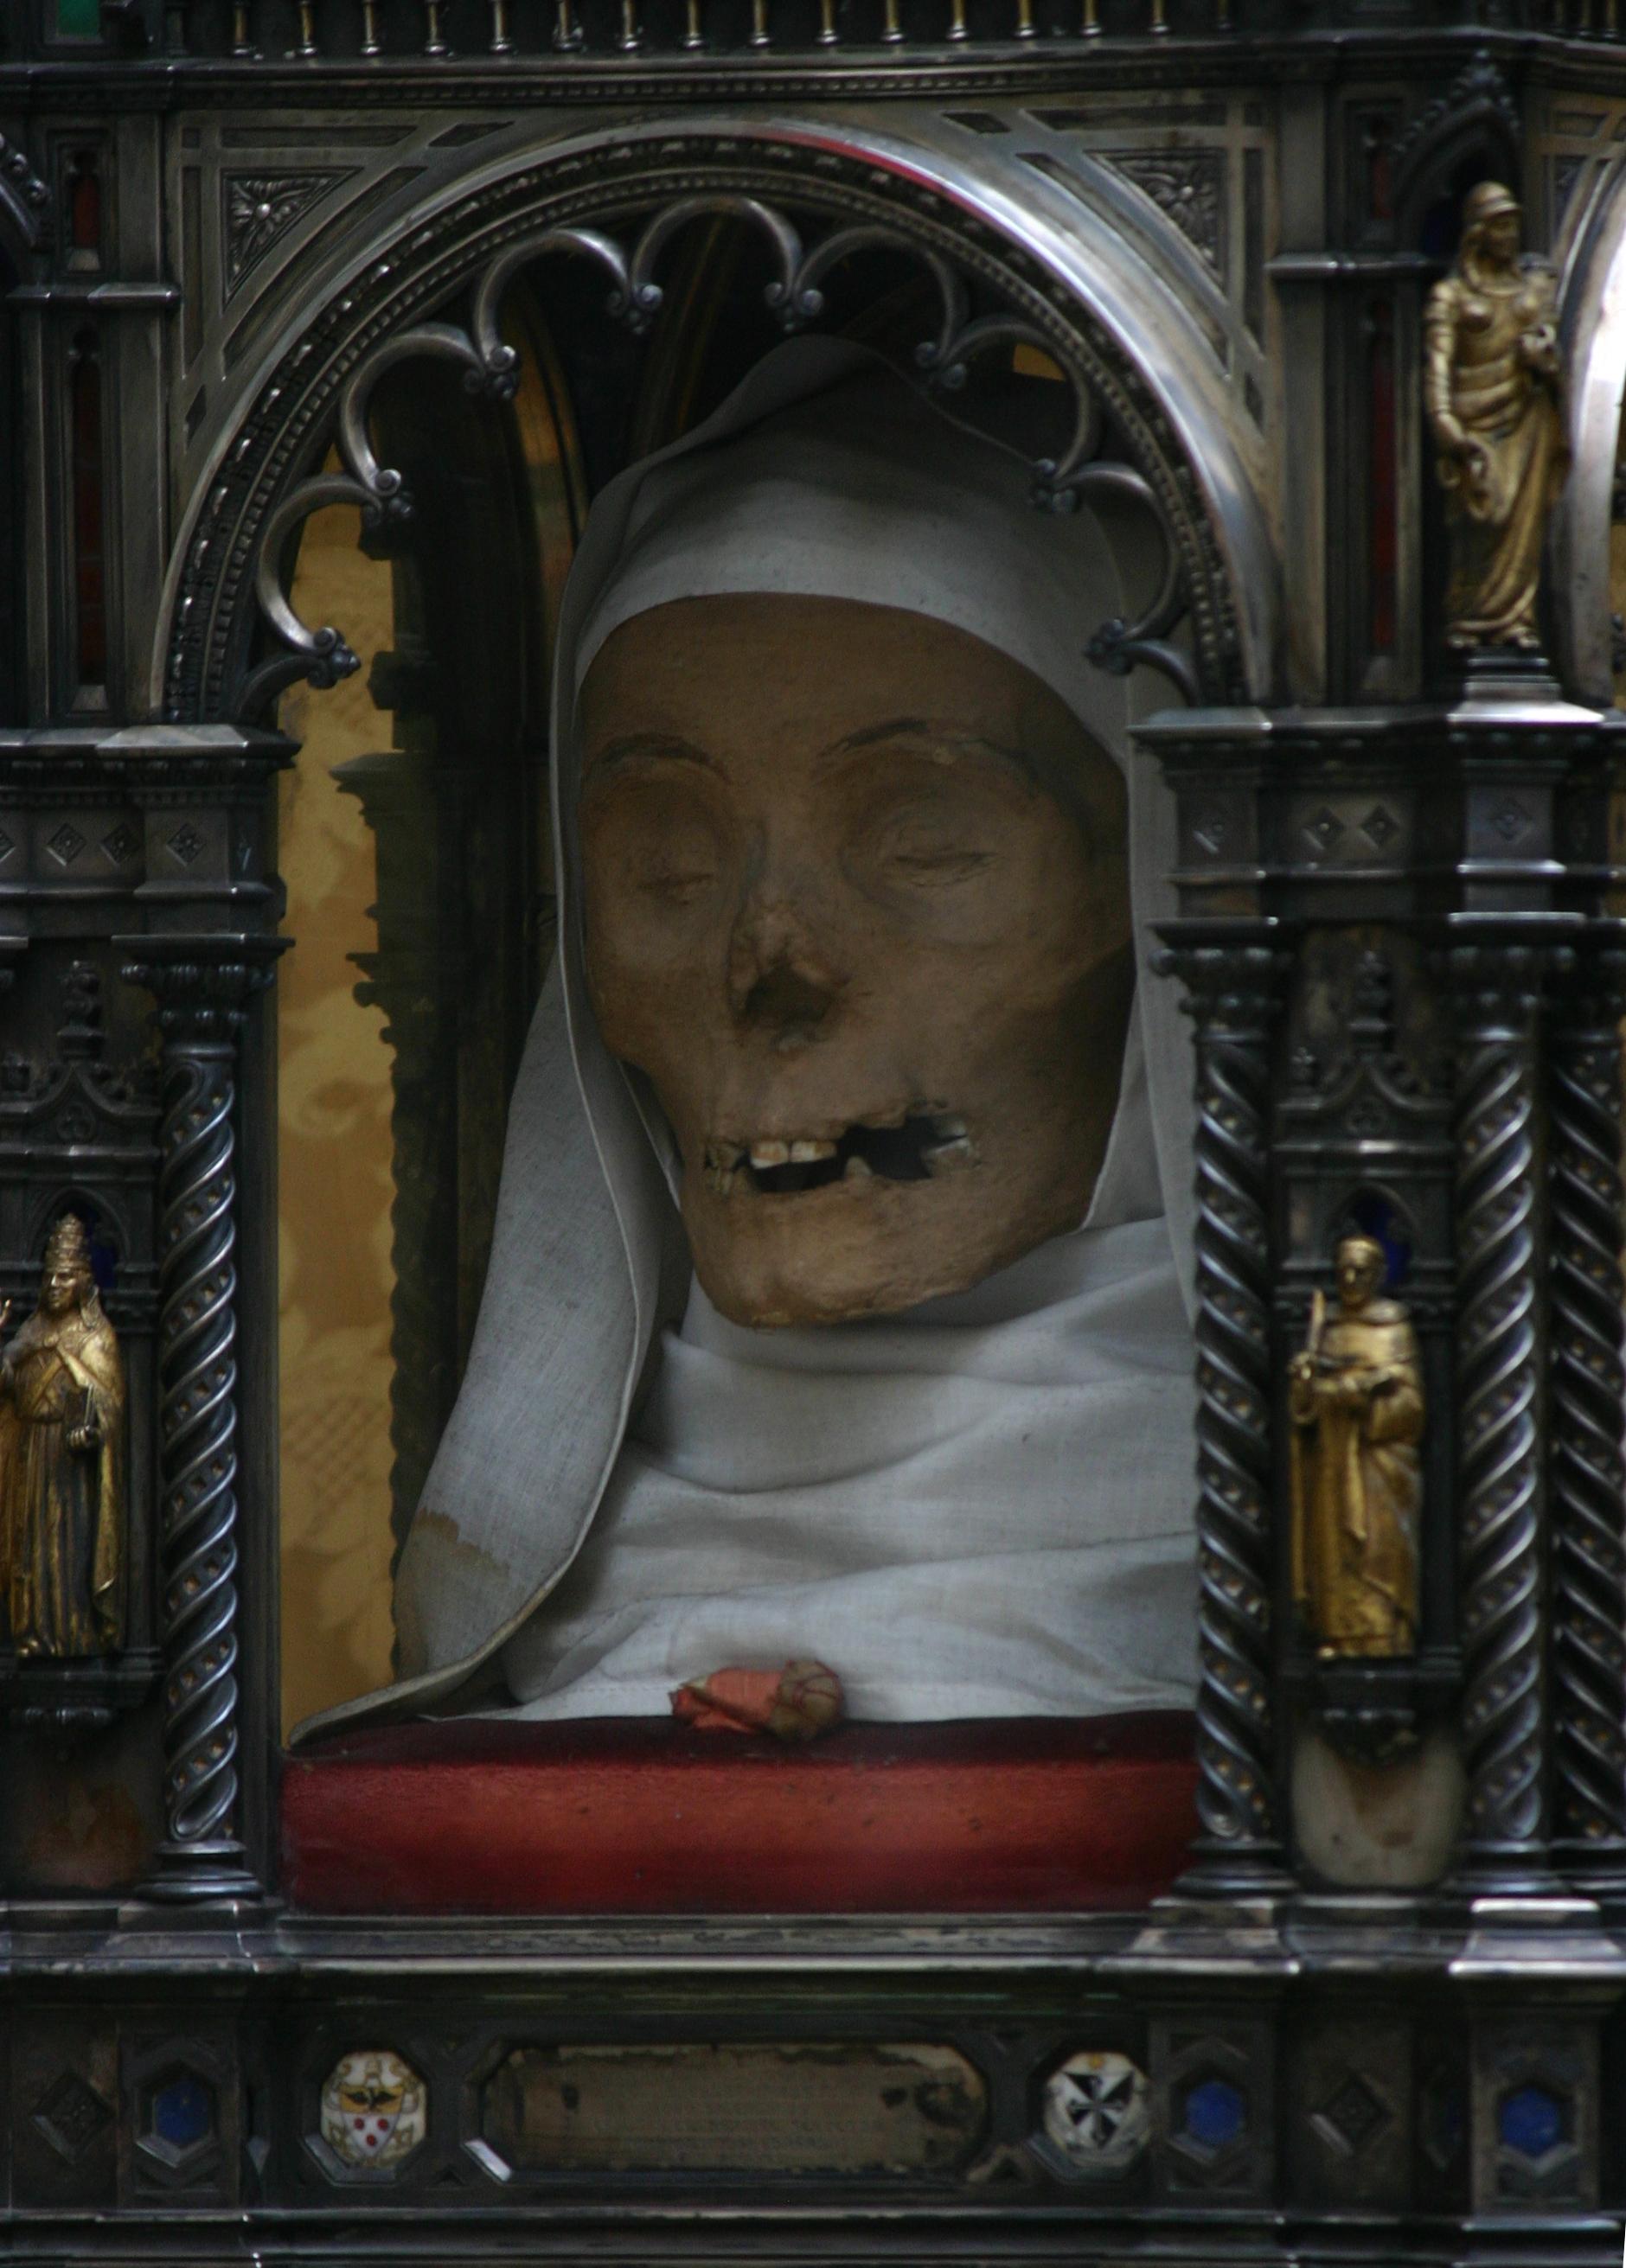 The head of Saint Catherine of Siena